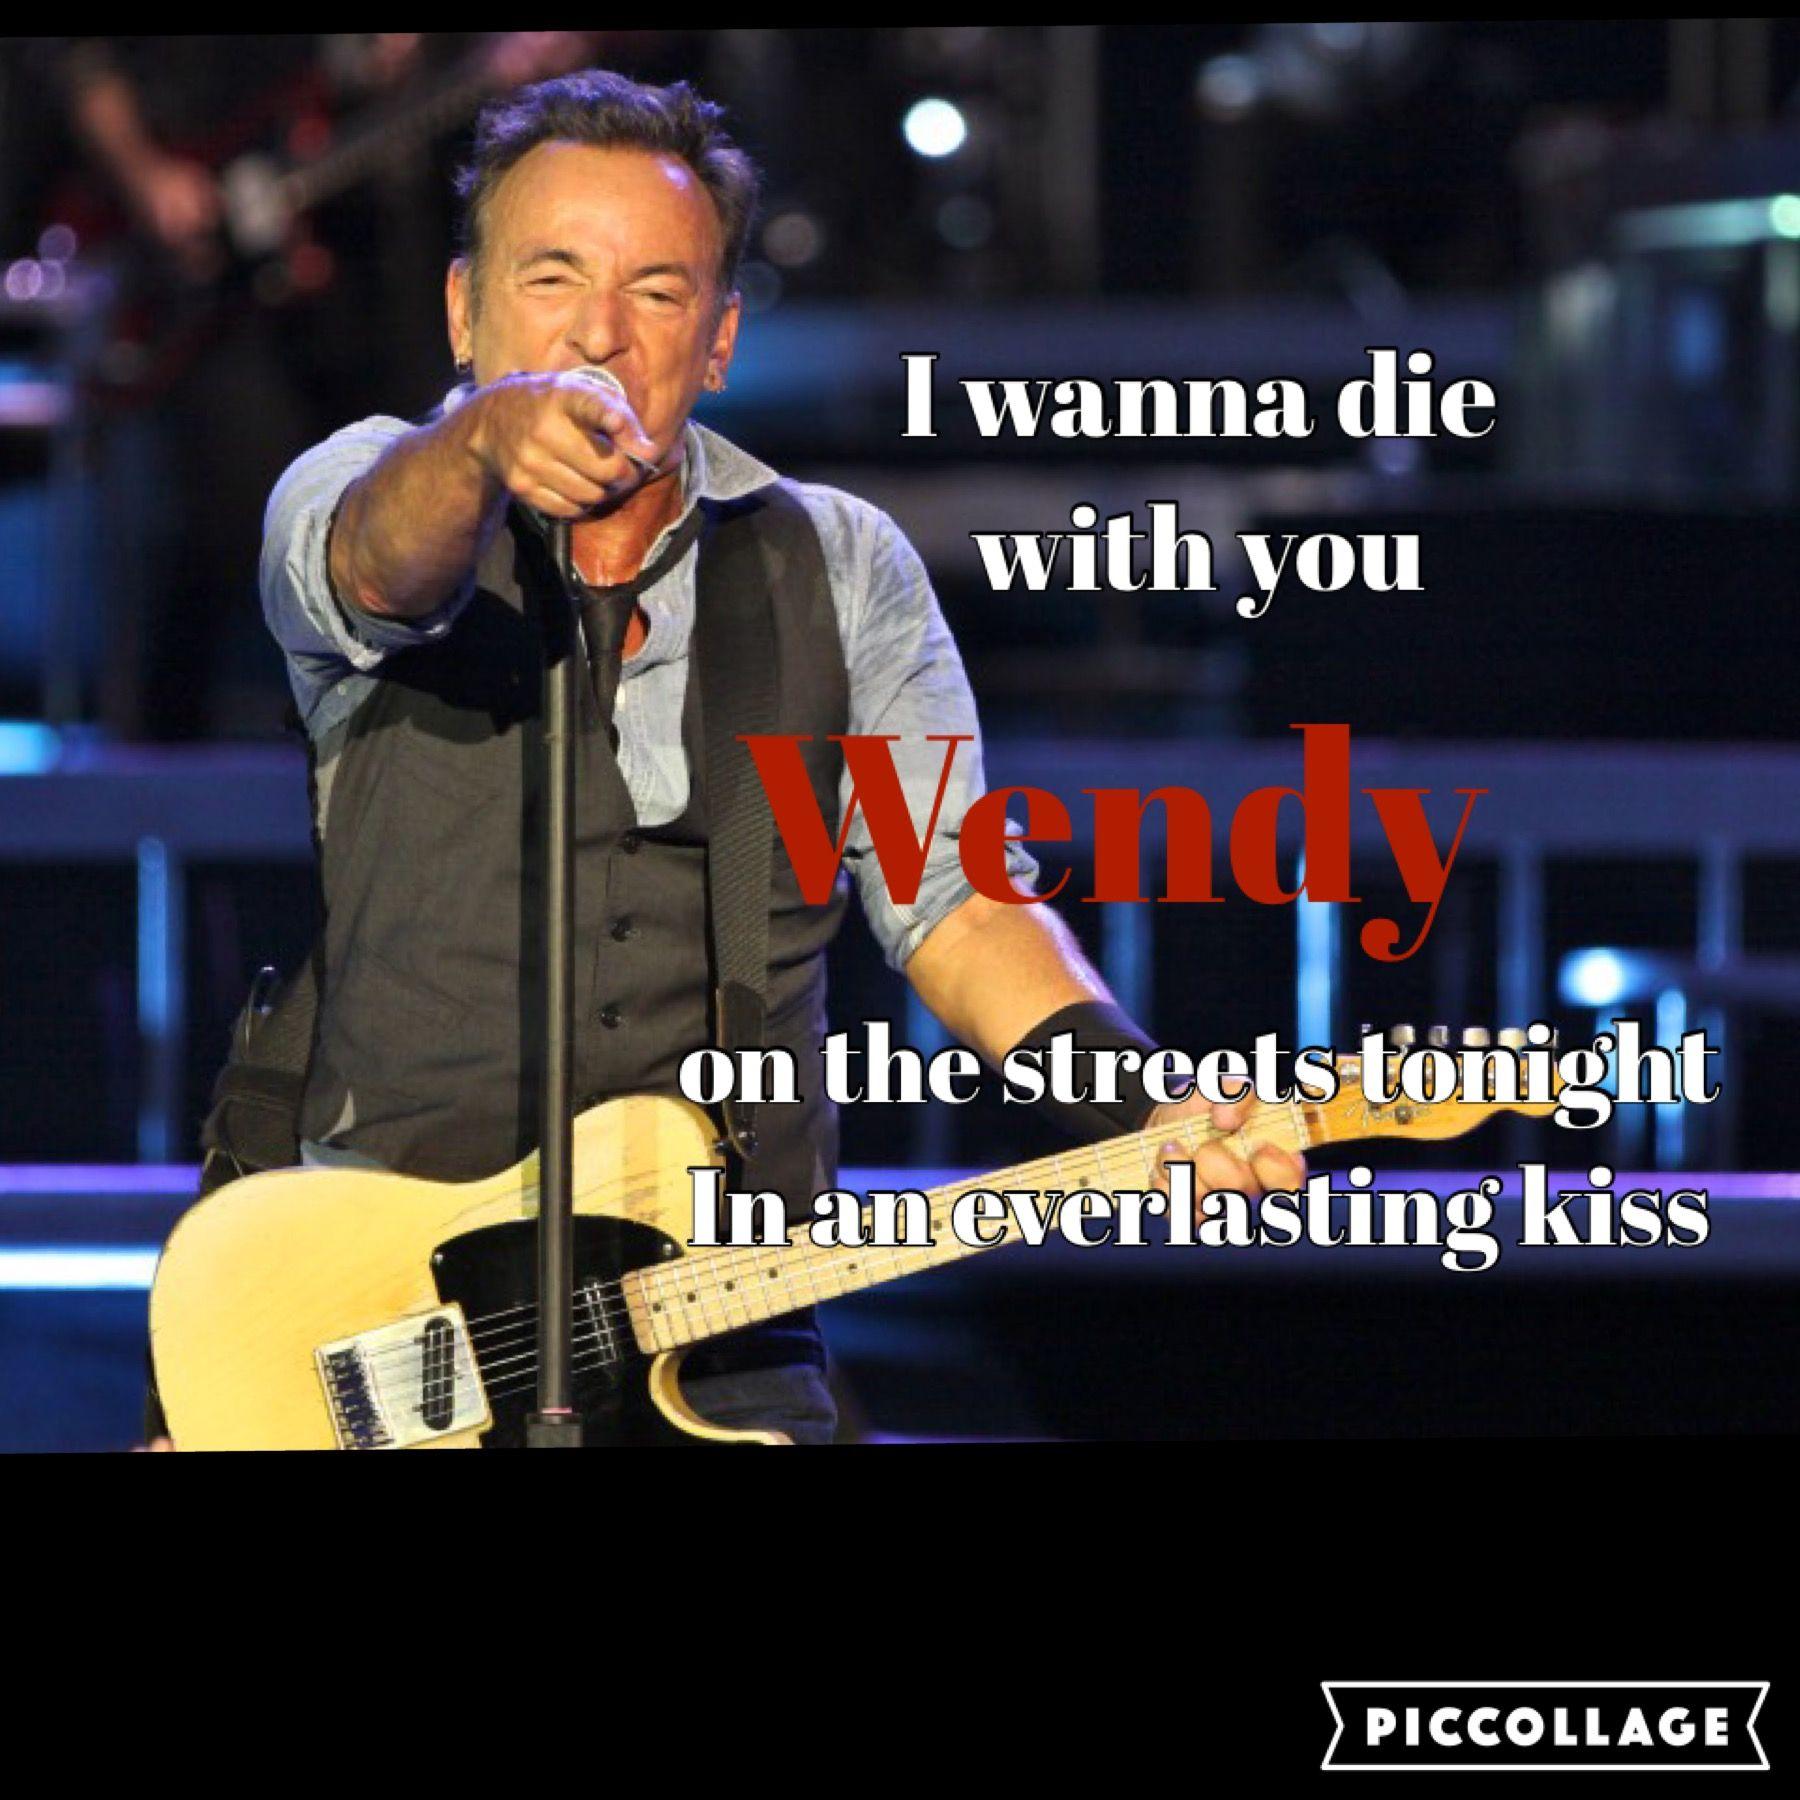 Run Meme Song Lyrics